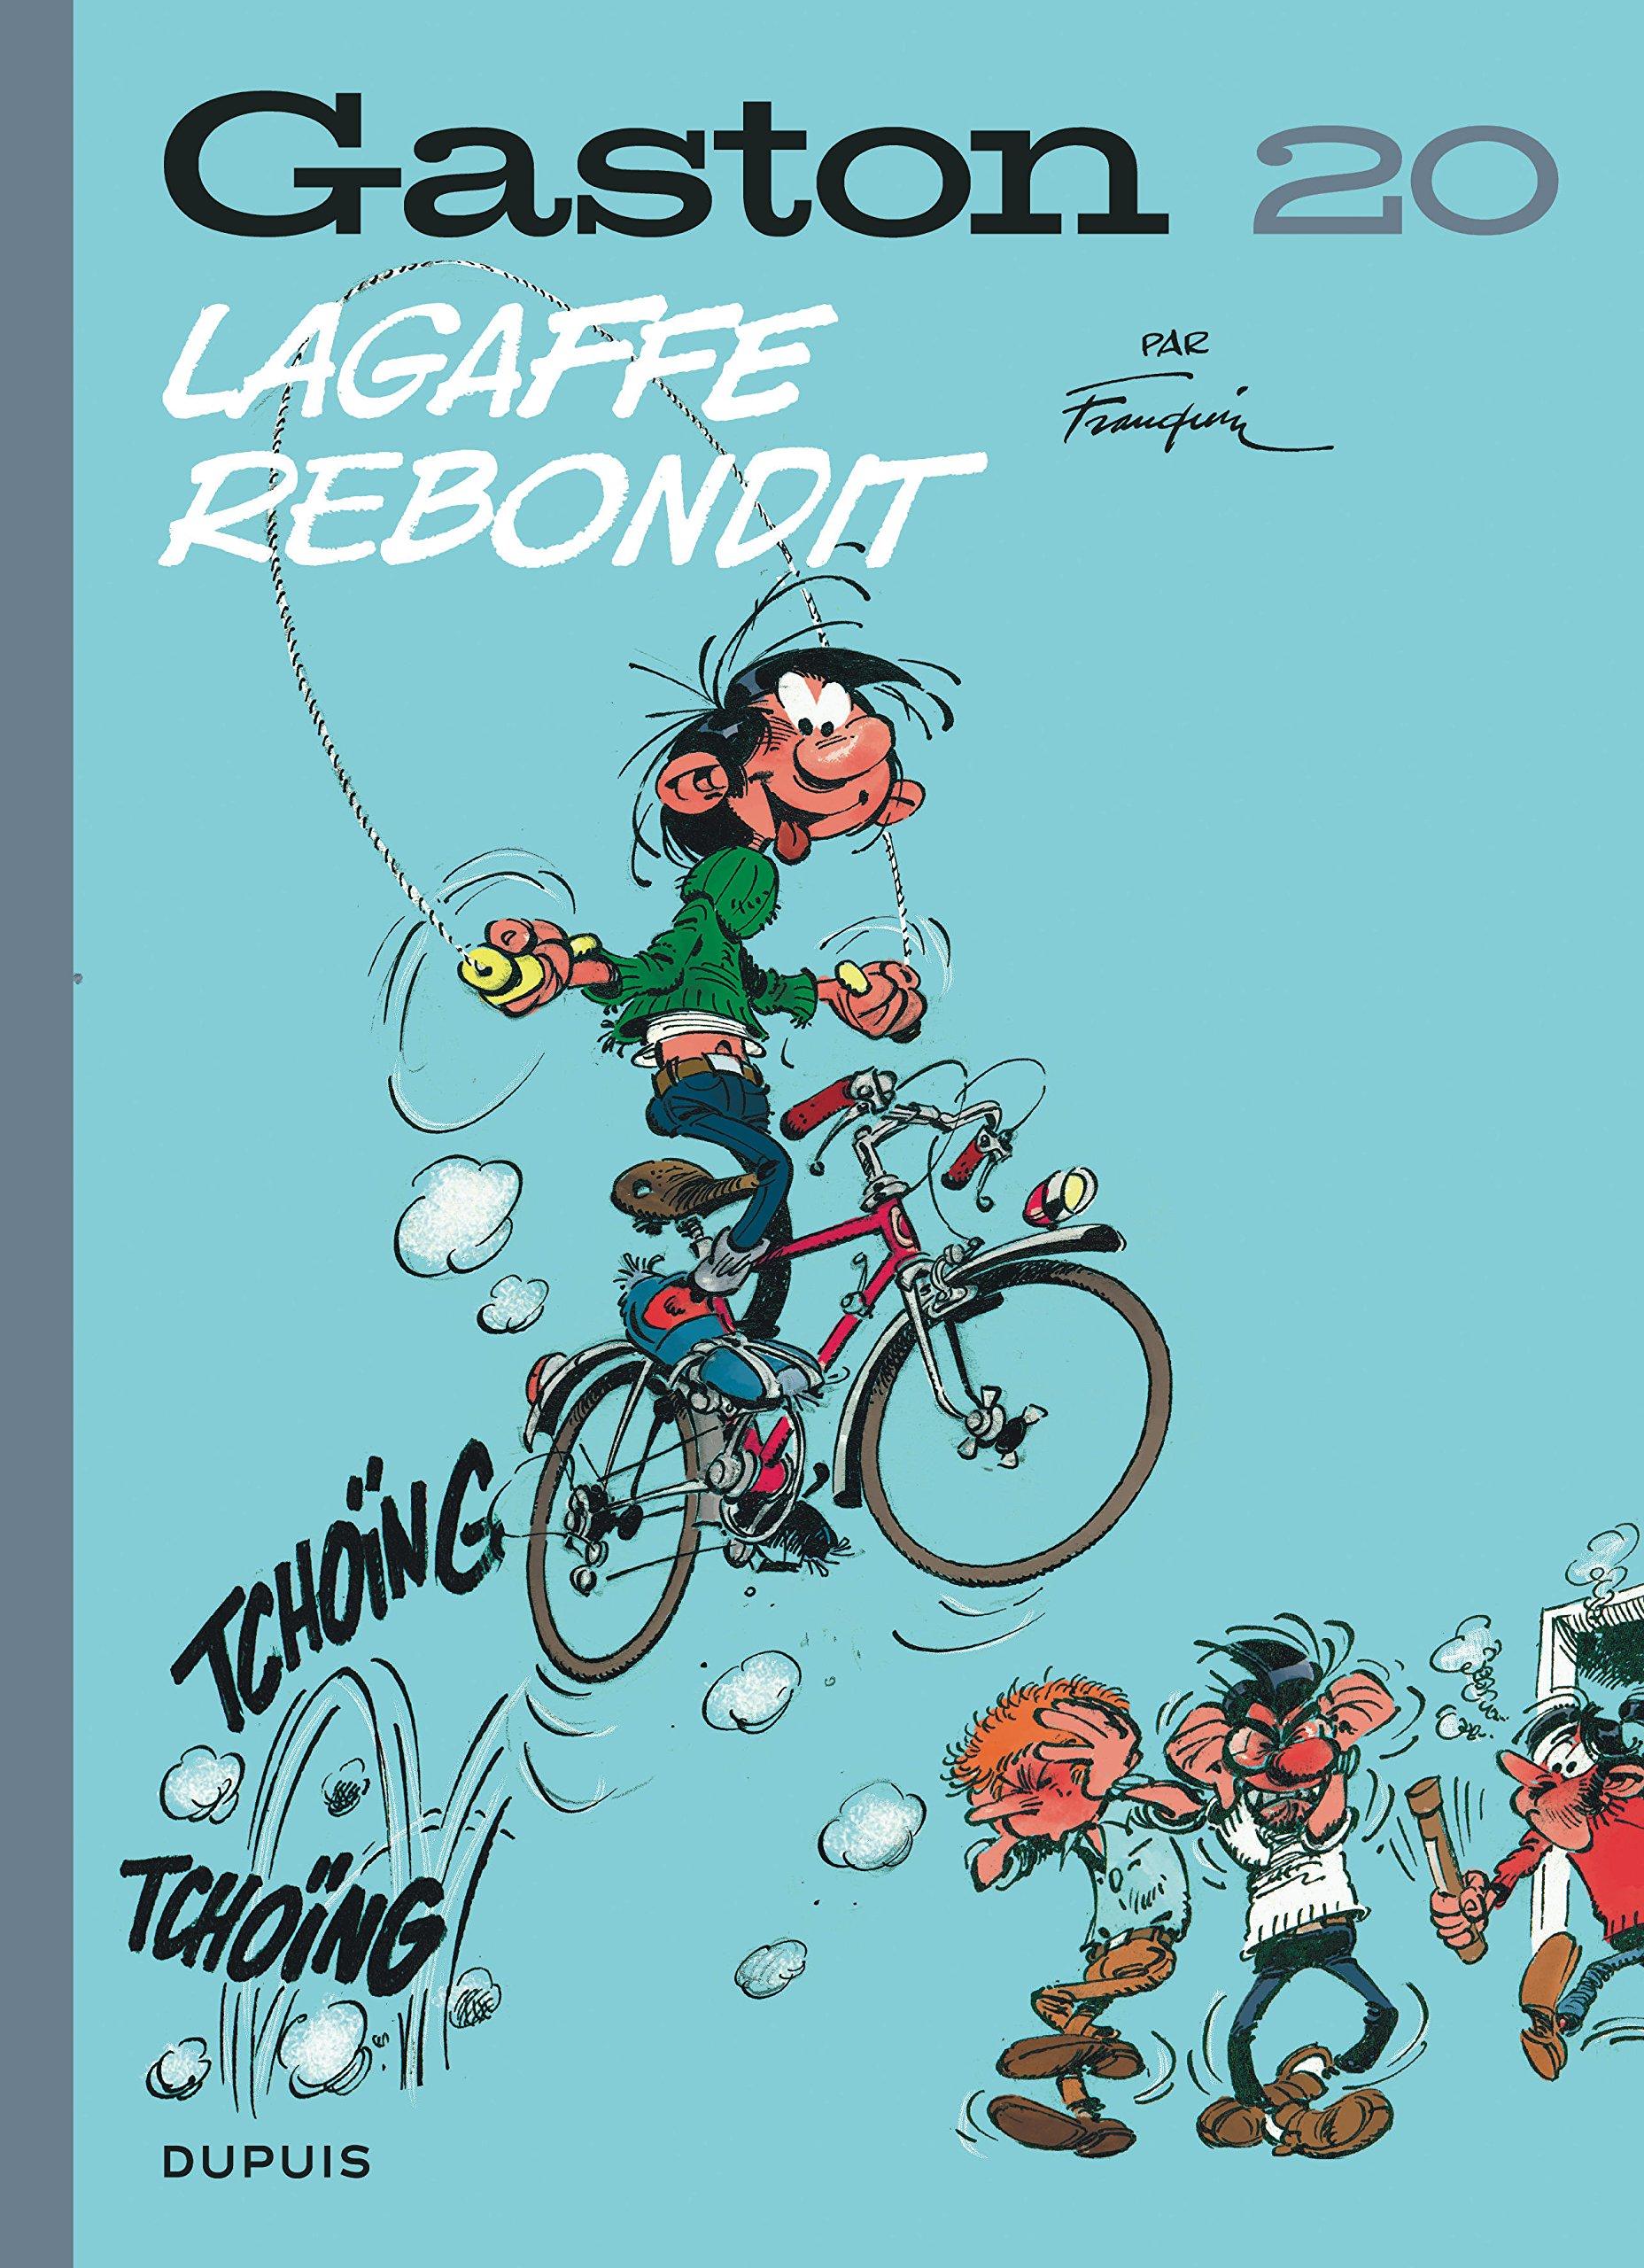 Gaston (Edition 2018) - tome 20 - Lagaffe rebondit (Edition 2018) Album – 16 mars 2018 Franquin Dupuis B076ML49ZF BD jeunesse